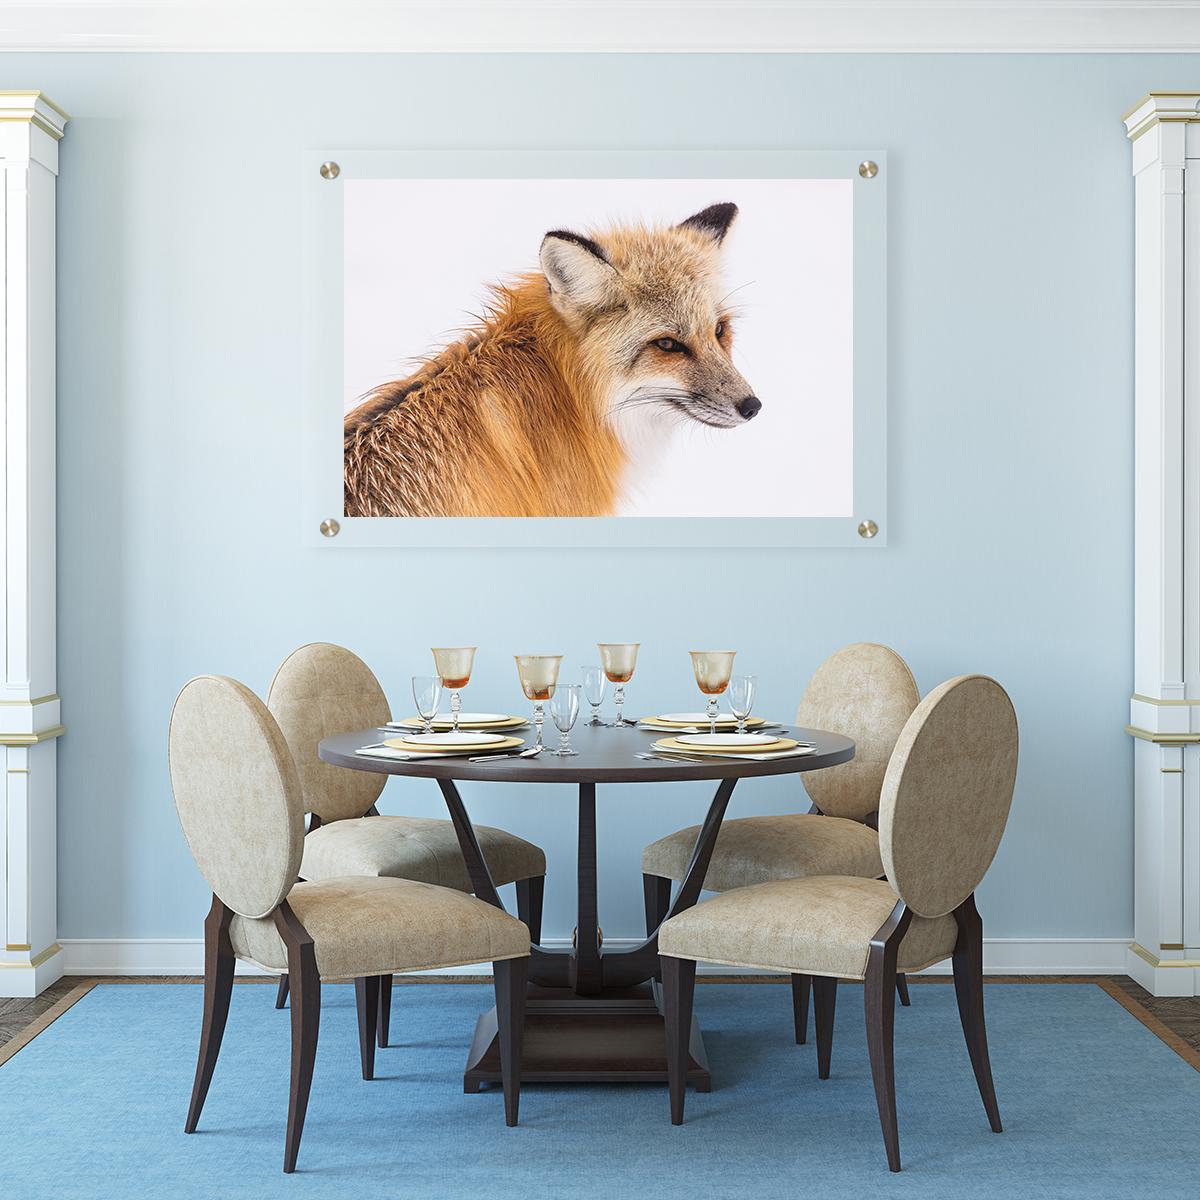 Custom Plexiglass Fox in Dining Room